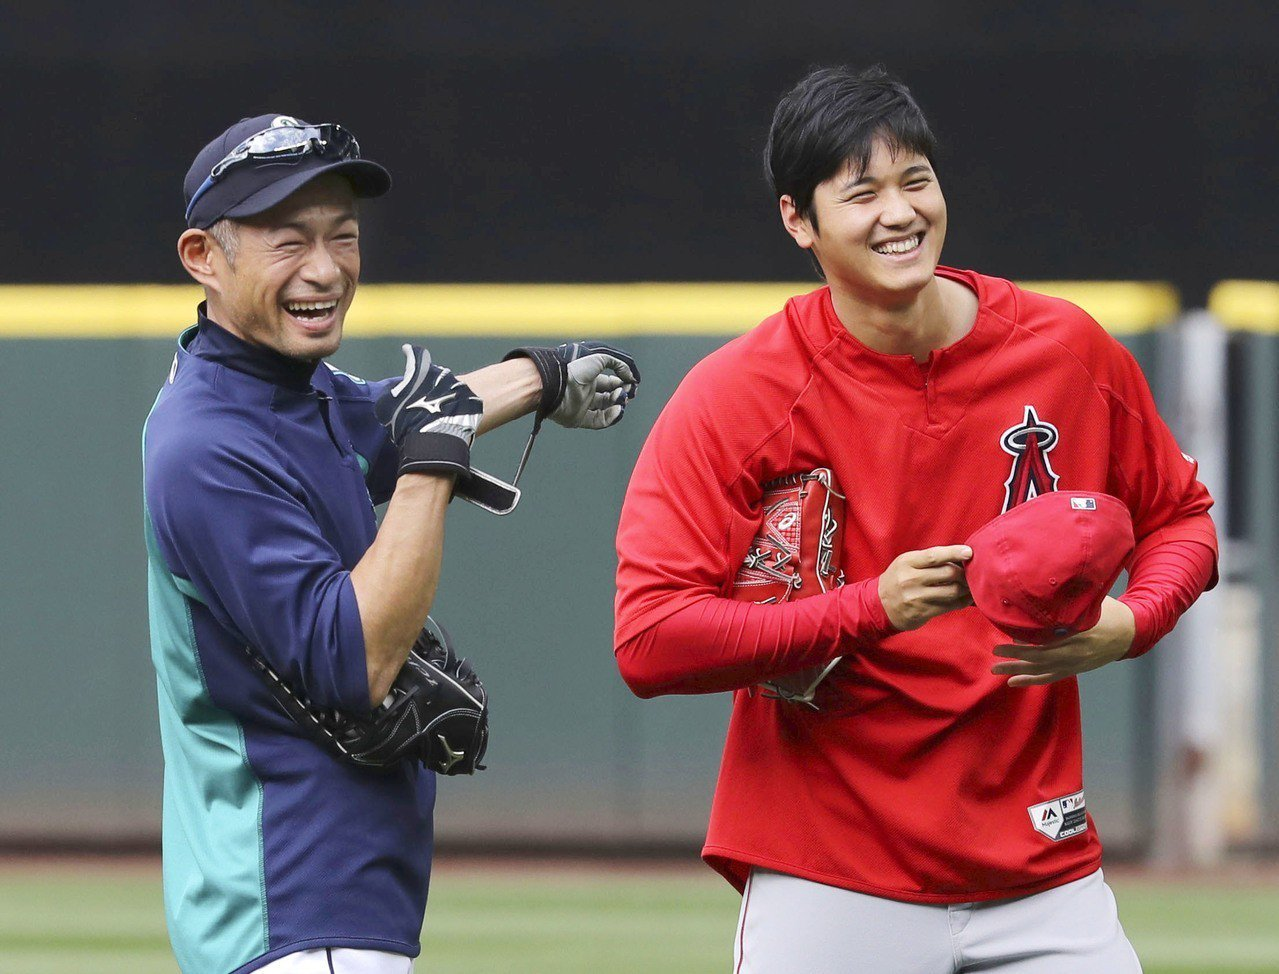 MLB/一朗引退提他名字 大谷翔平「飯心」爆發